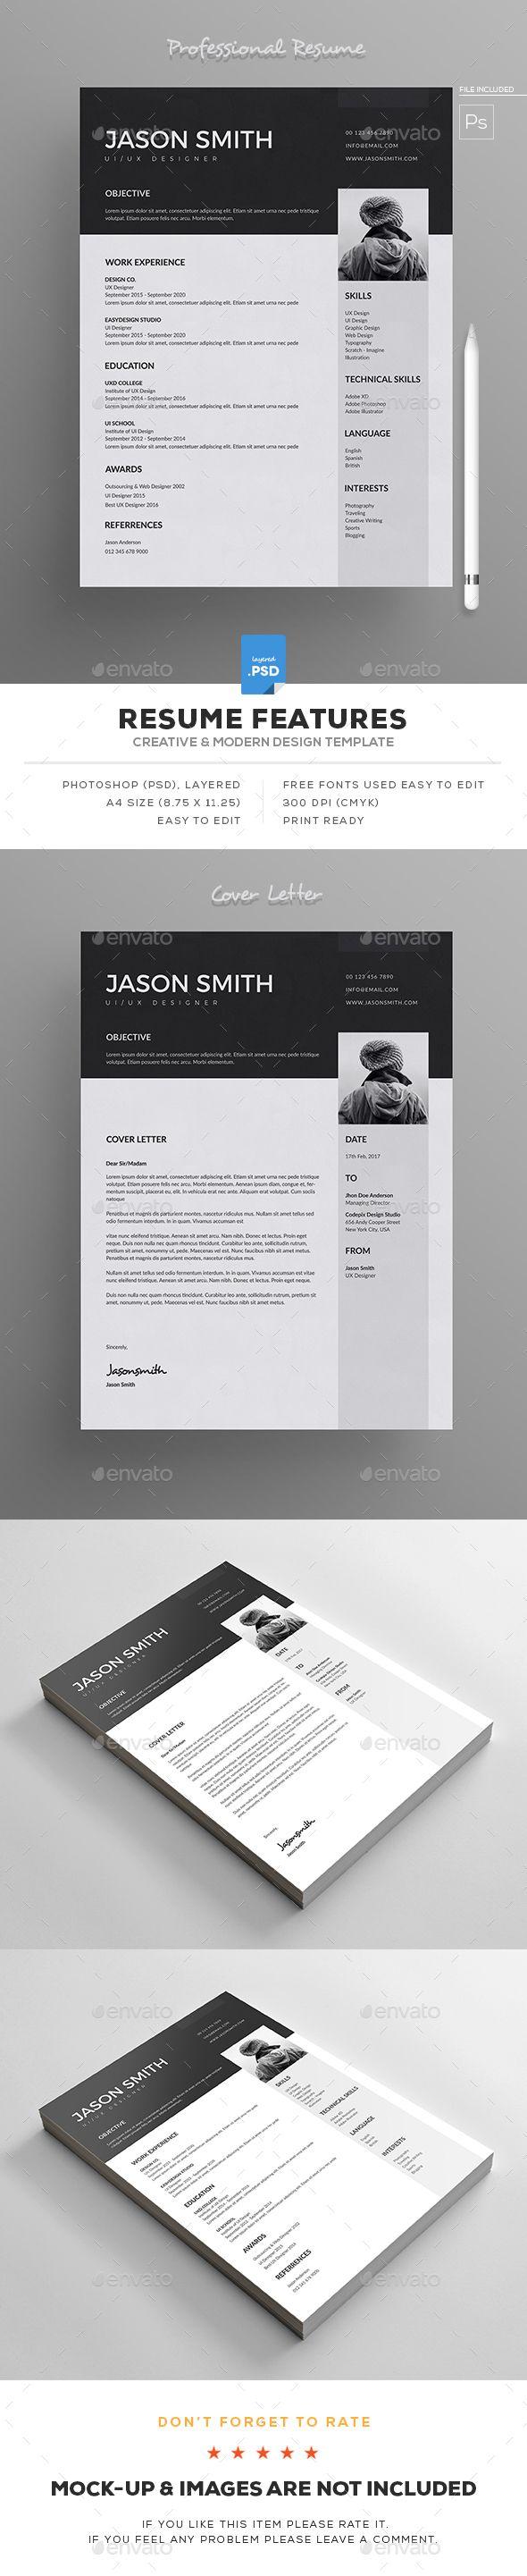 Resume | Template, Cv template and Resume cv